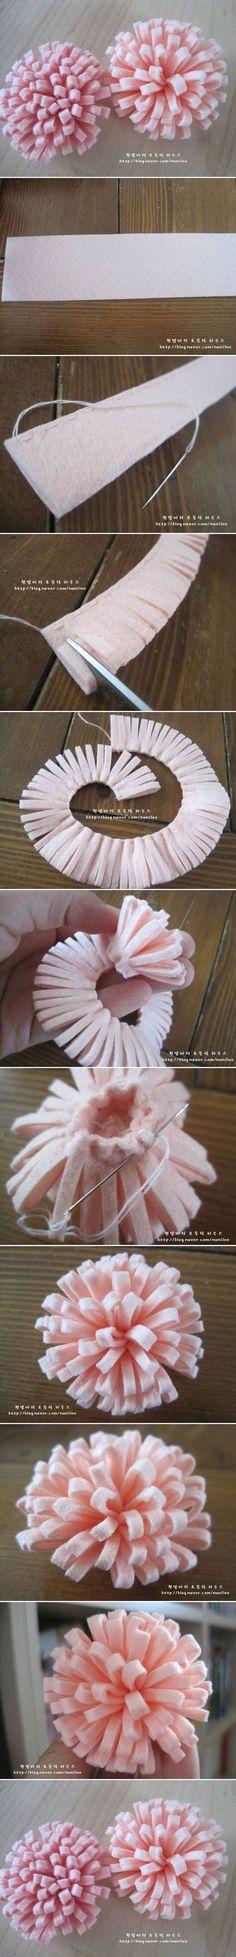 DIY Simple Easy Felt Flower: